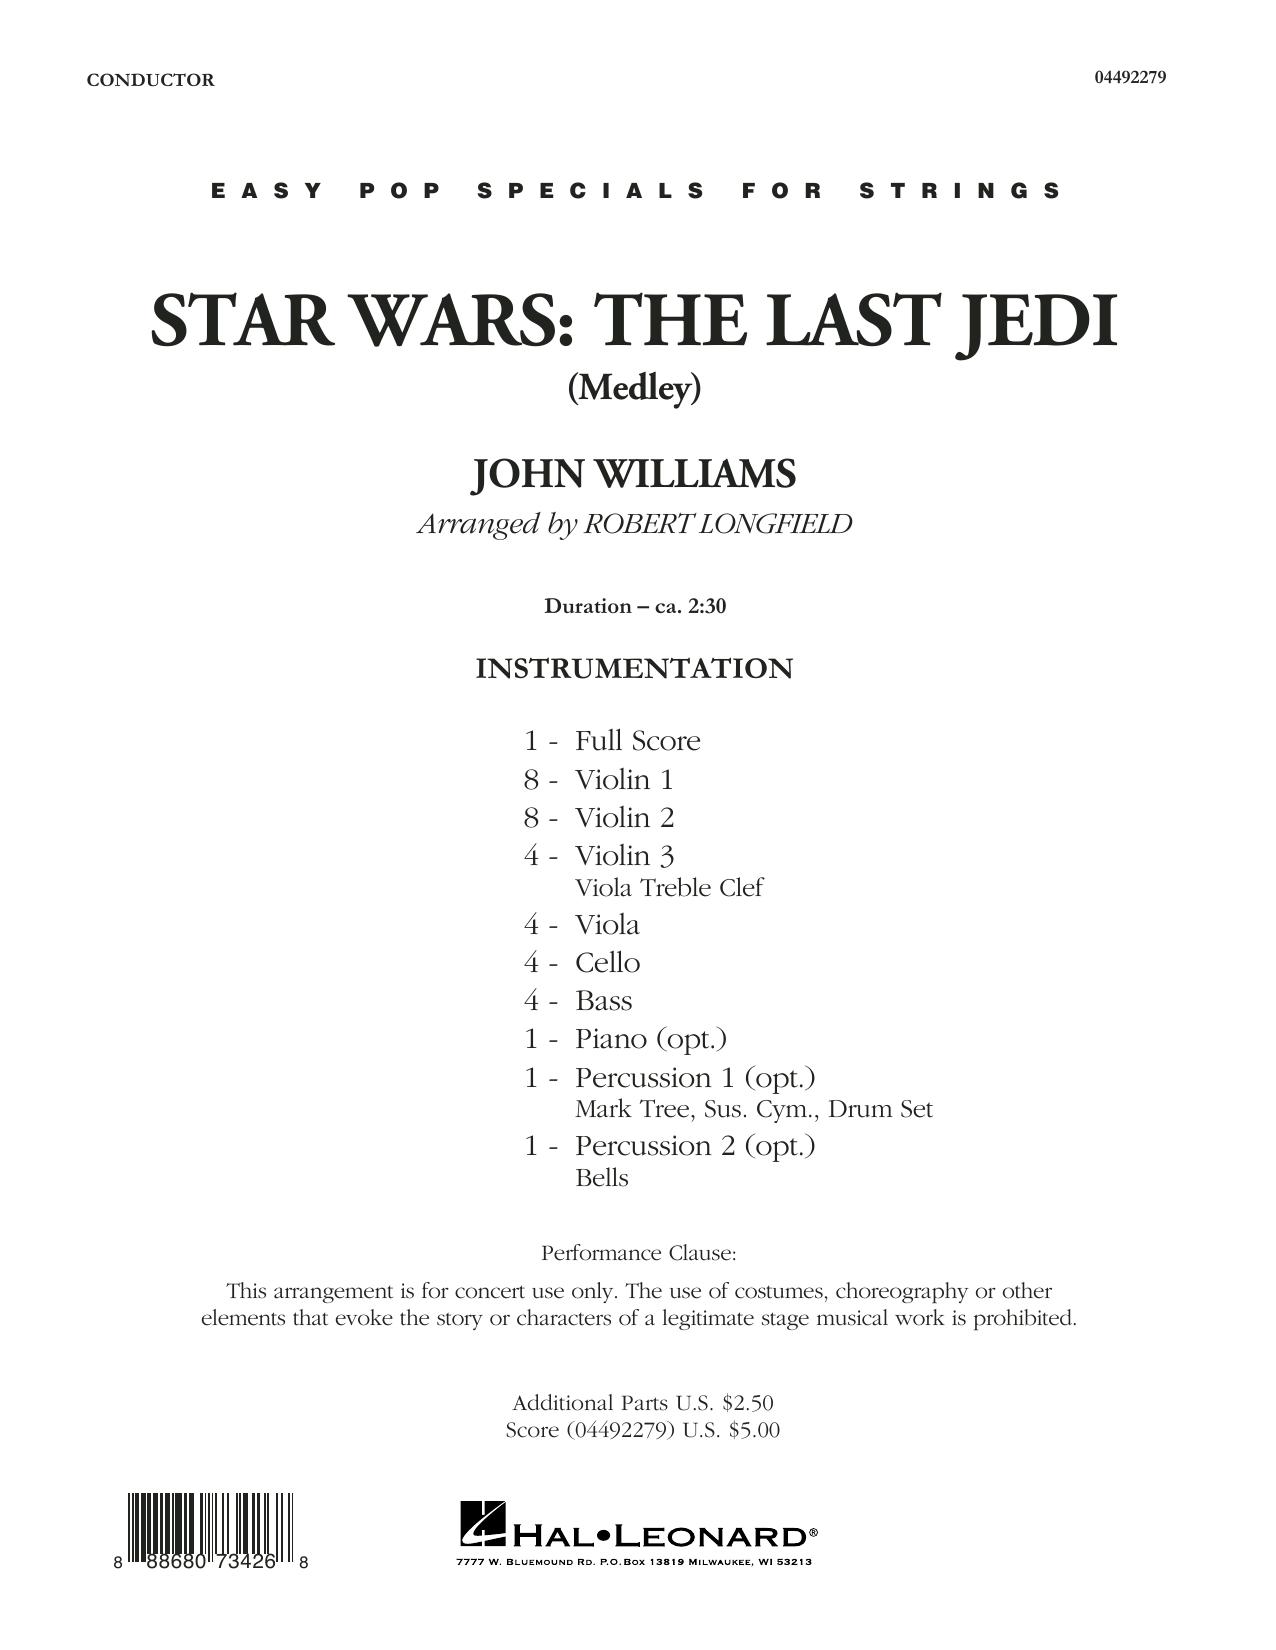 Star Wars: The Last Jedi (Medley) (arr. Robert Longfield) - Conductor Score (Full Score) (Orchestra)